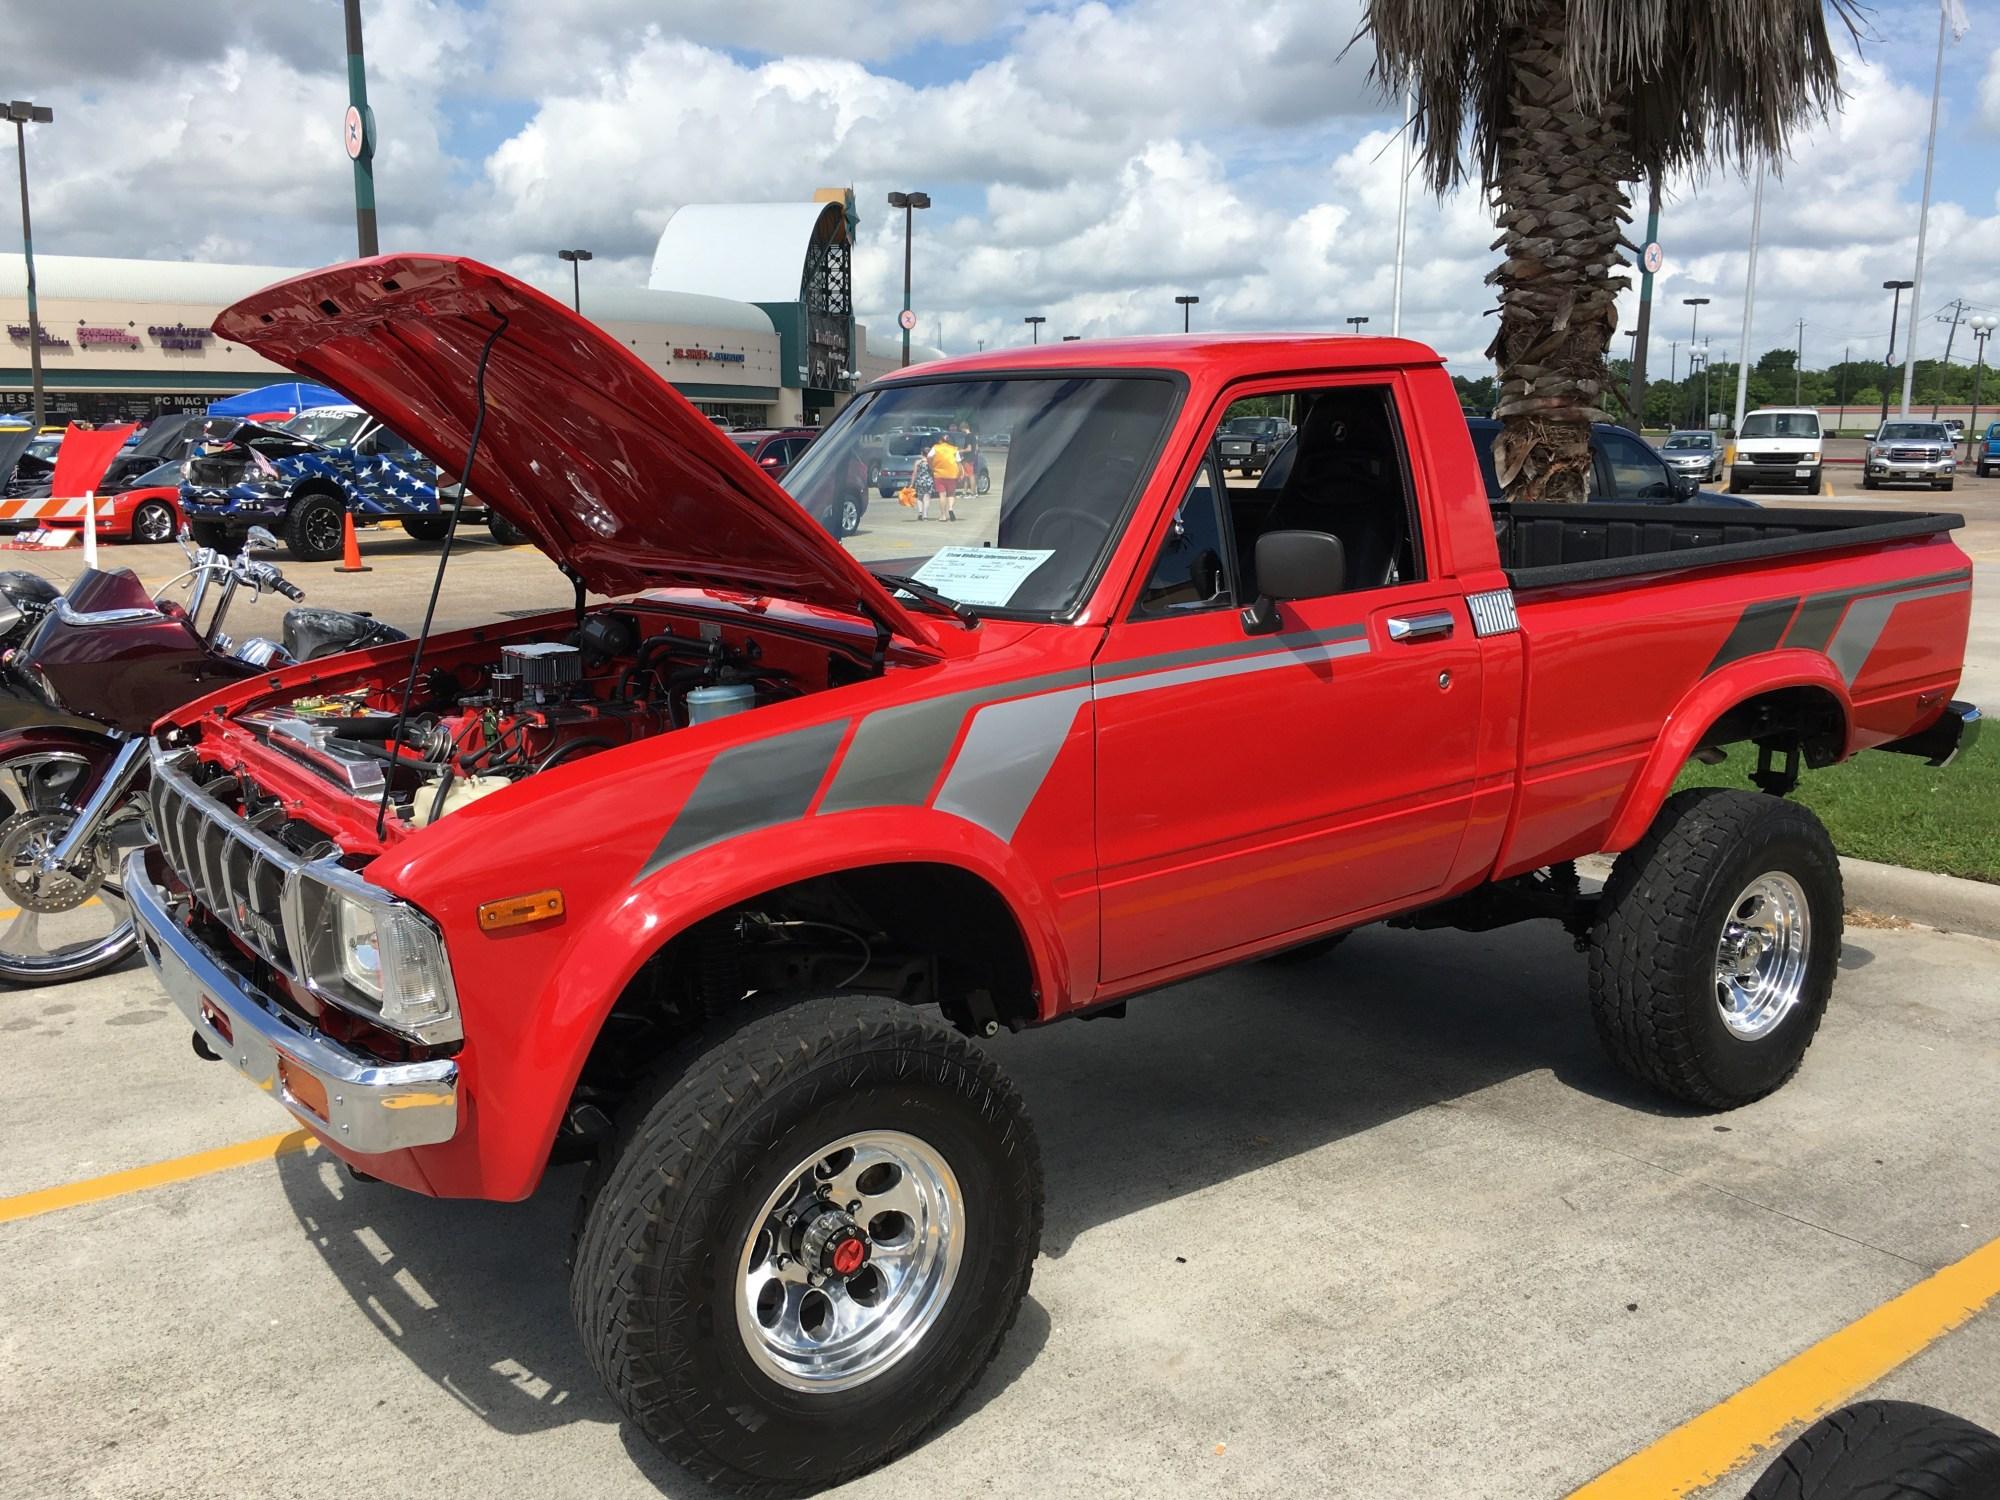 hight resolution of kawazx636 s 1983 toyota pickup restoration img 4376 jpg